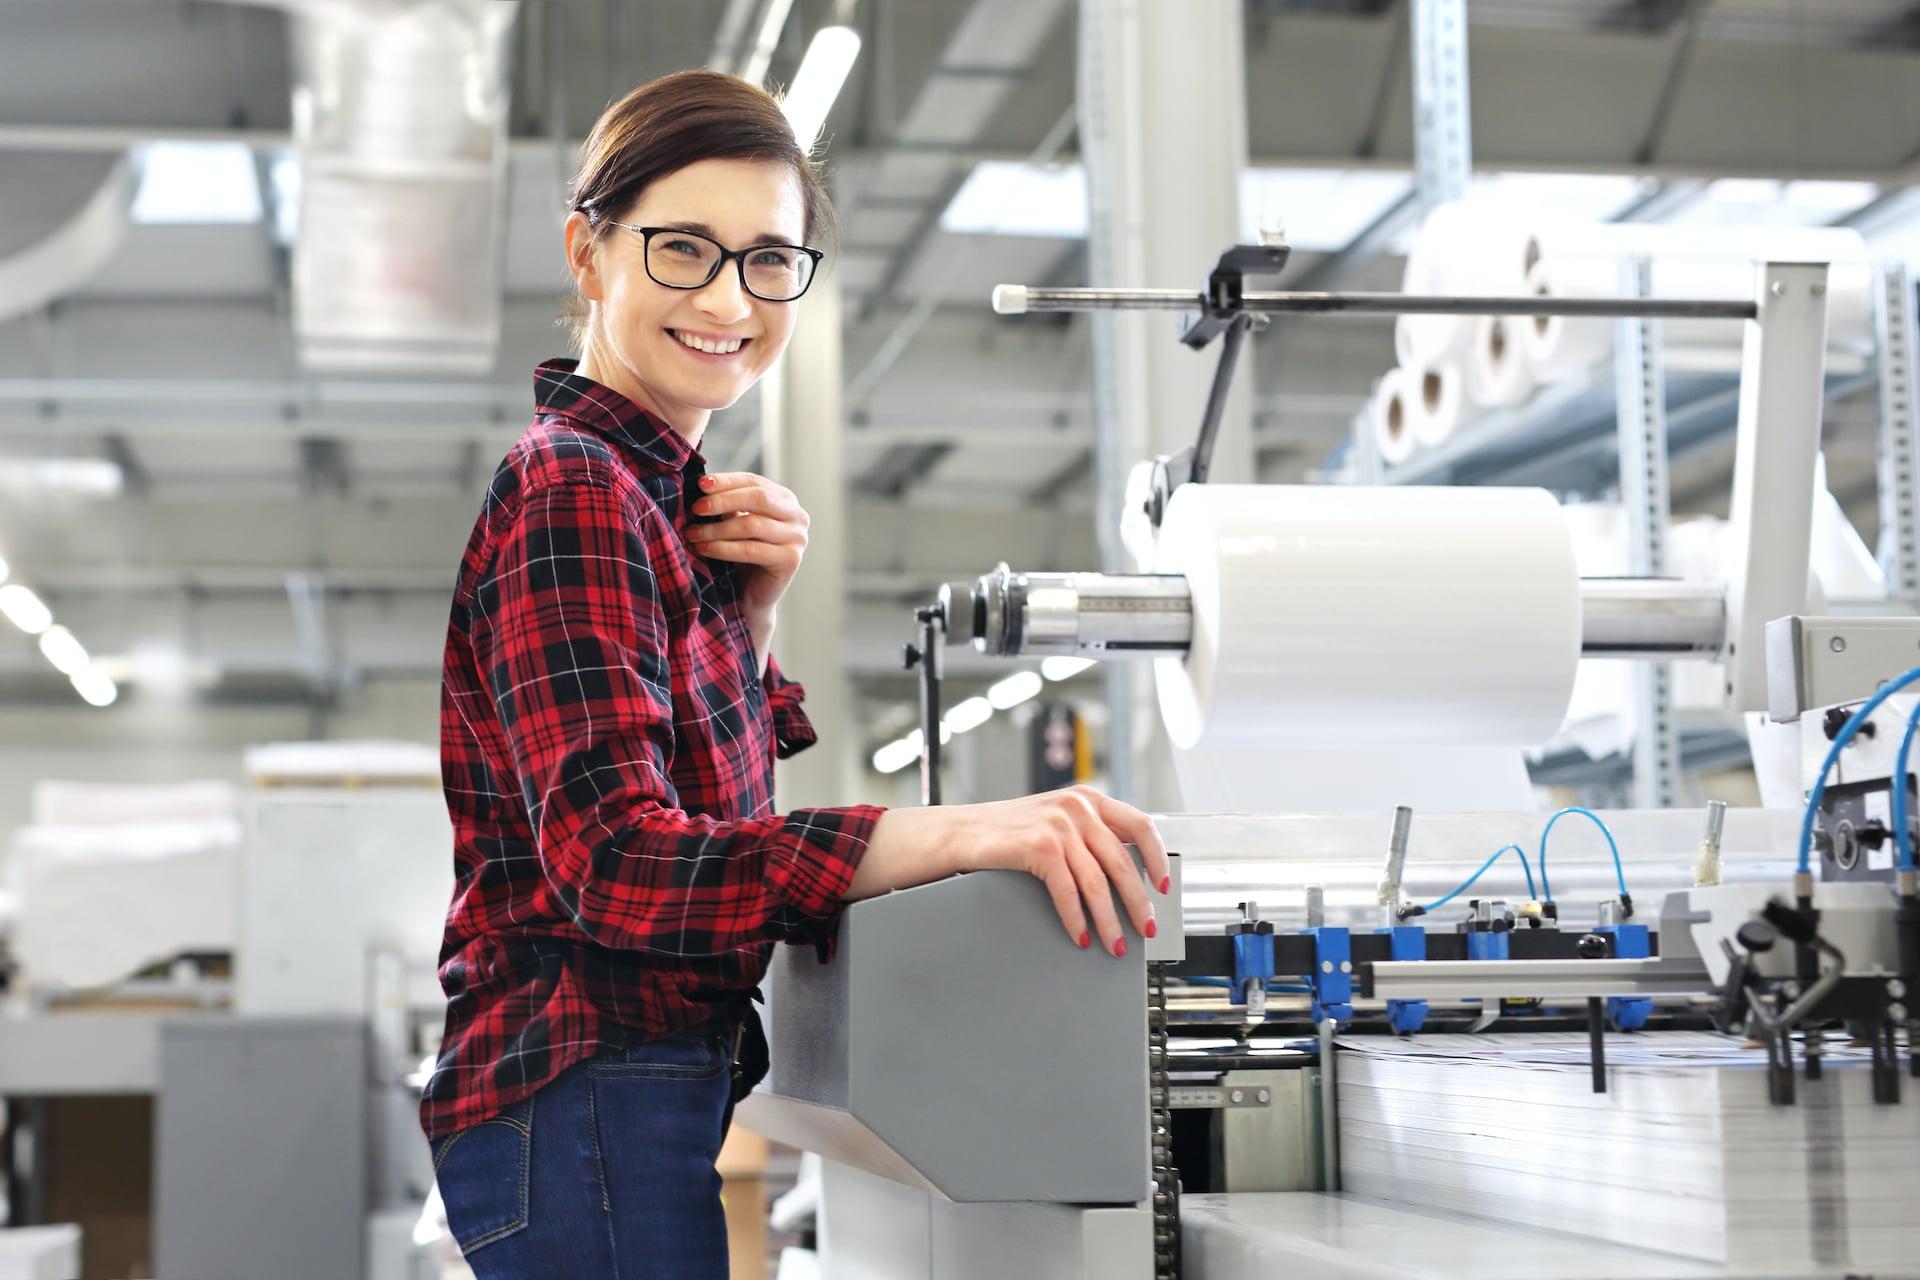 Produktionsmitarbeiter Siebdruck DUOjob GmbH